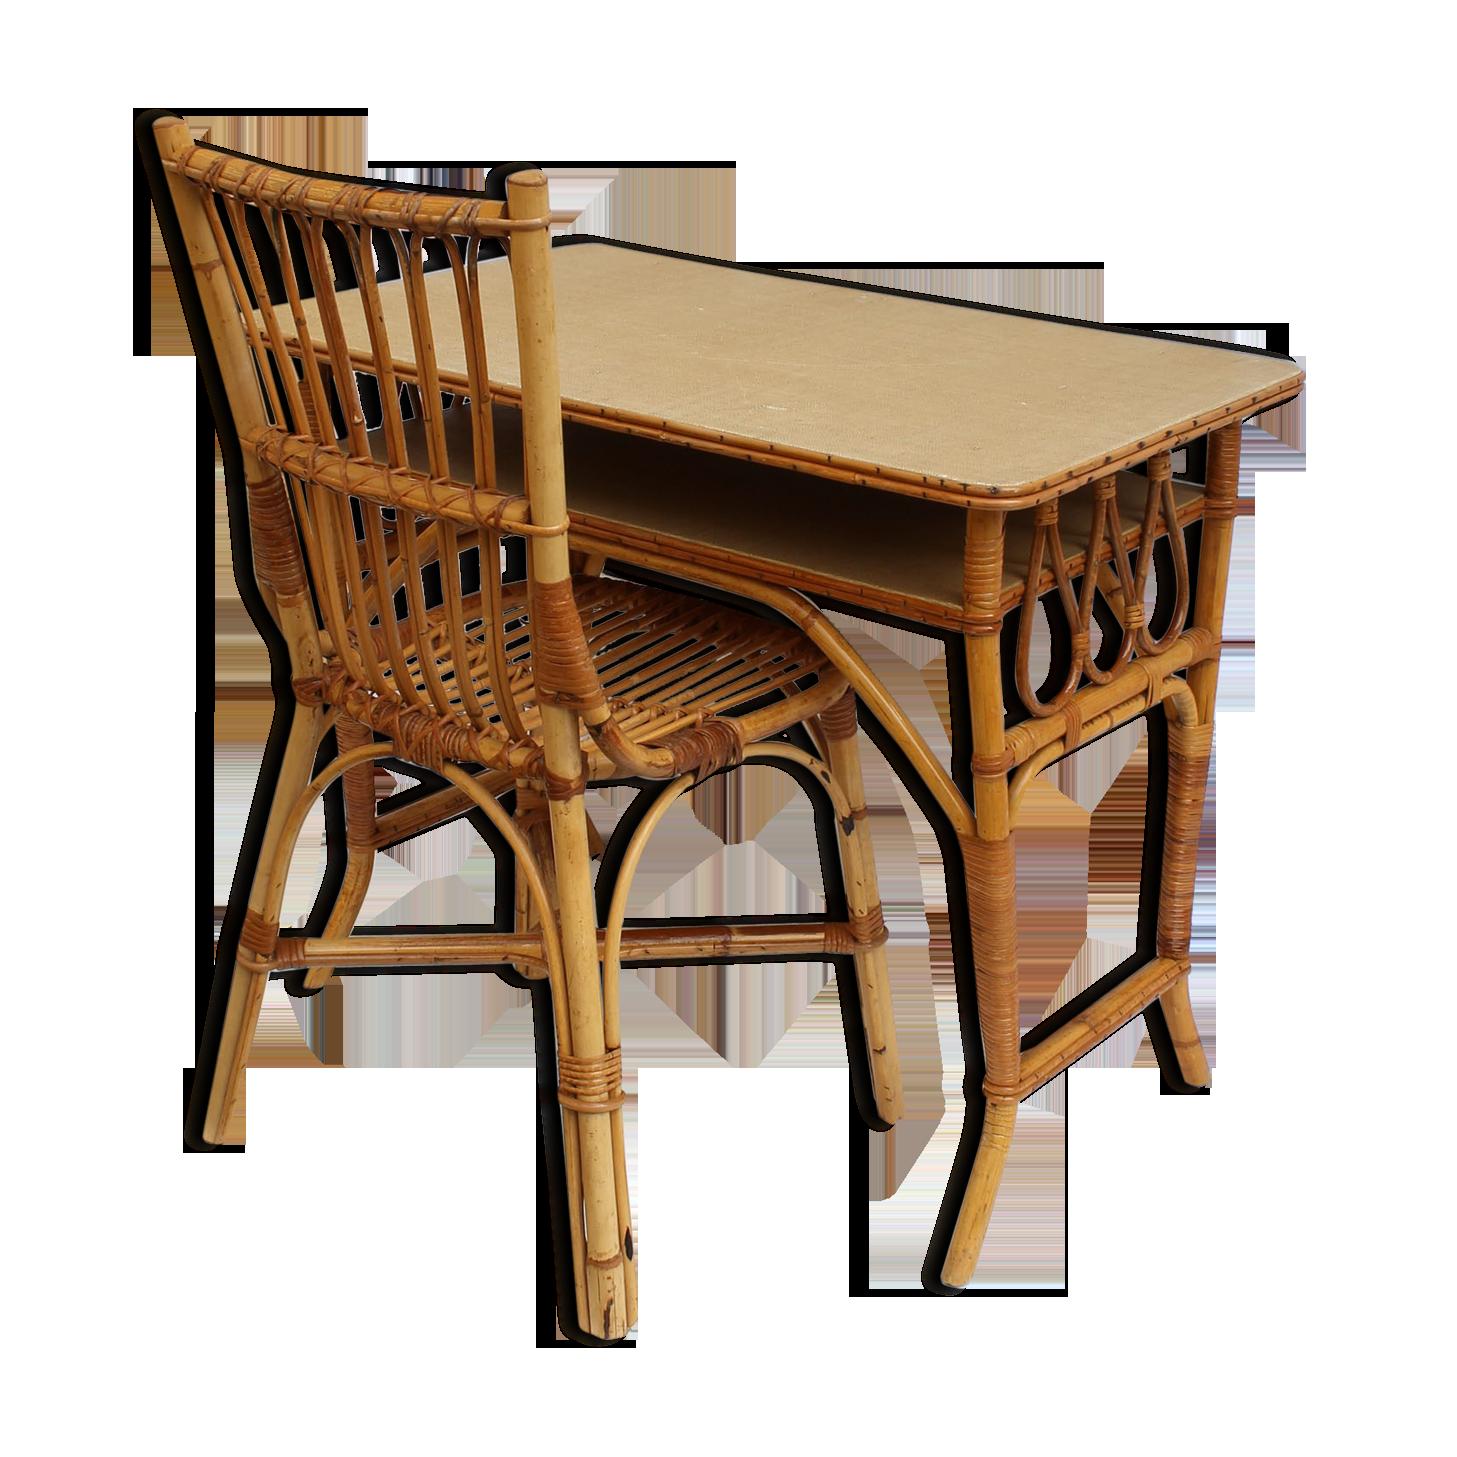 Bureau en rotin et sa chaise rotin et osier bois couleur